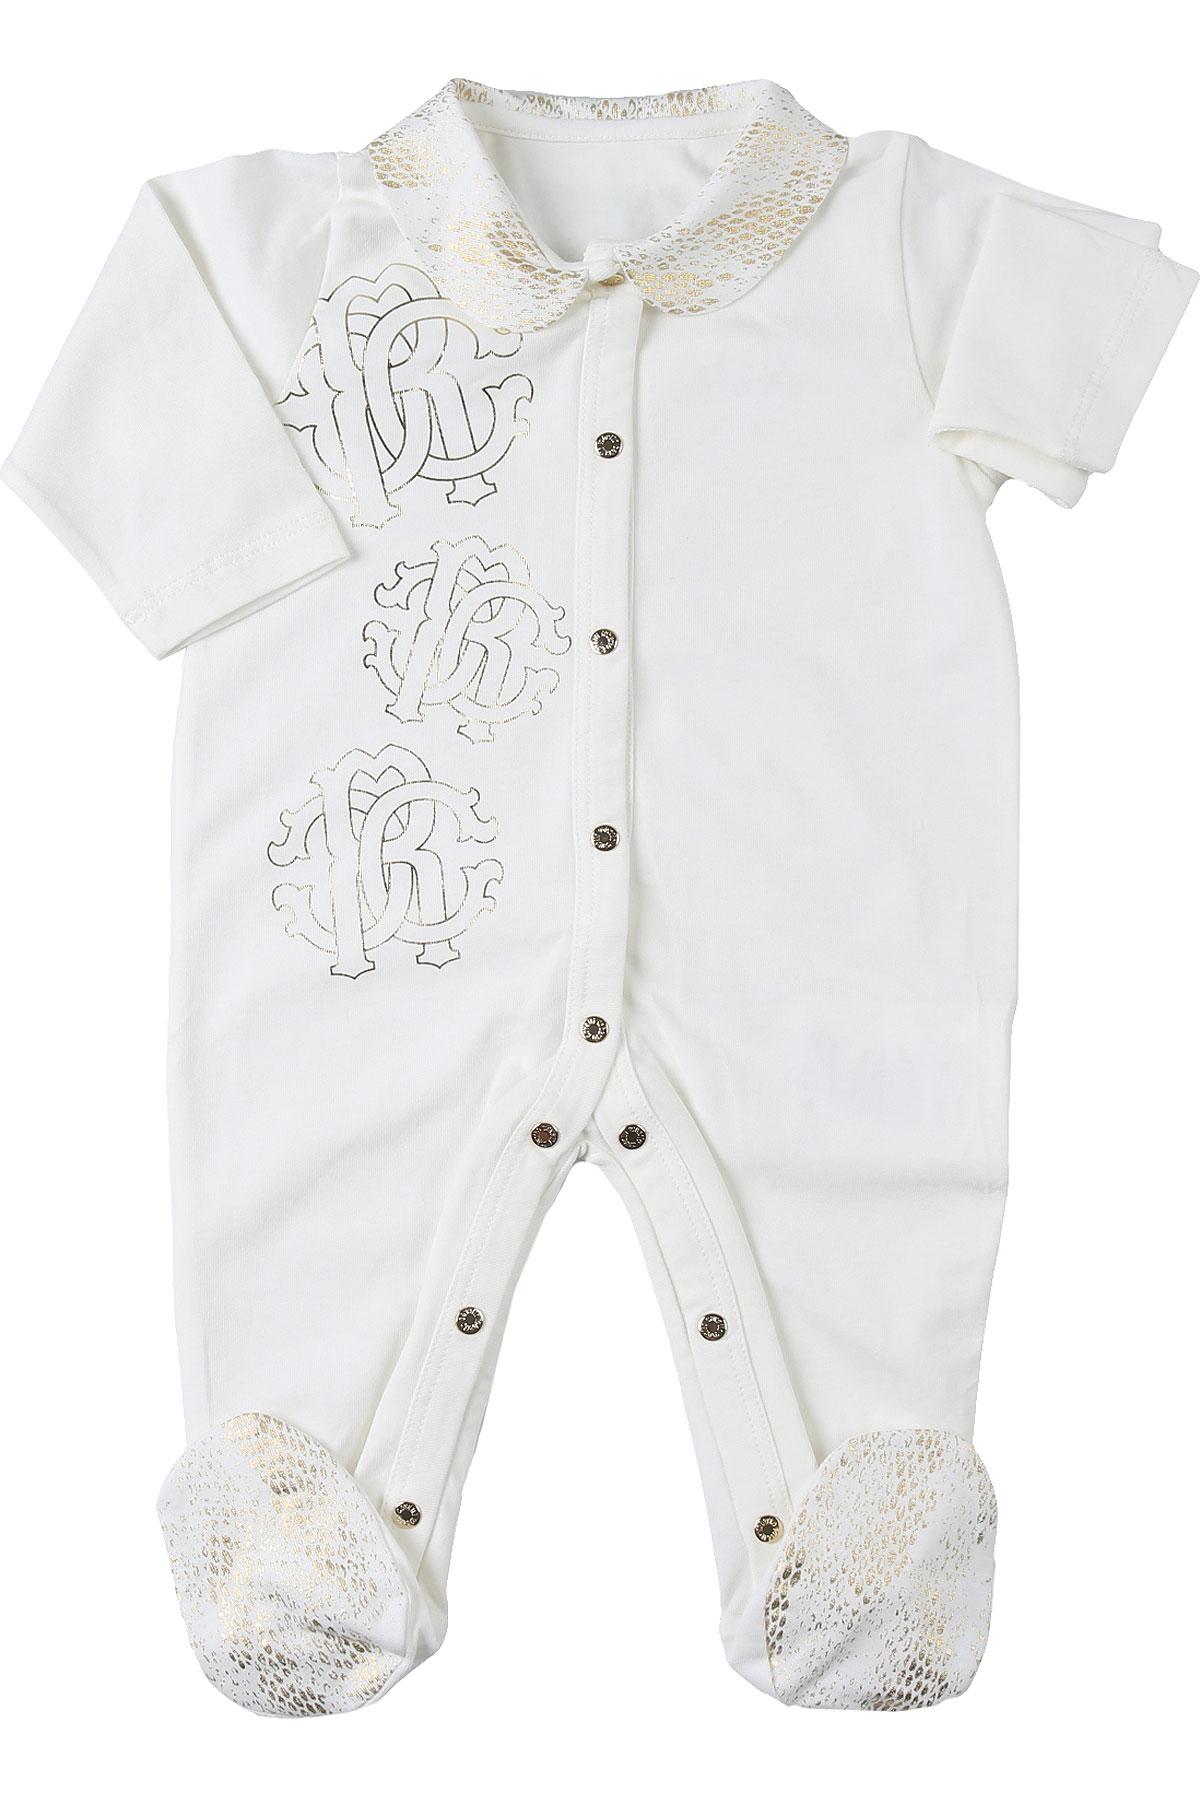 Roberto Cavalli Baby Bodysuits & Onesies for Girls On Sale, Cream, Cotton, 2019, 1M 3M